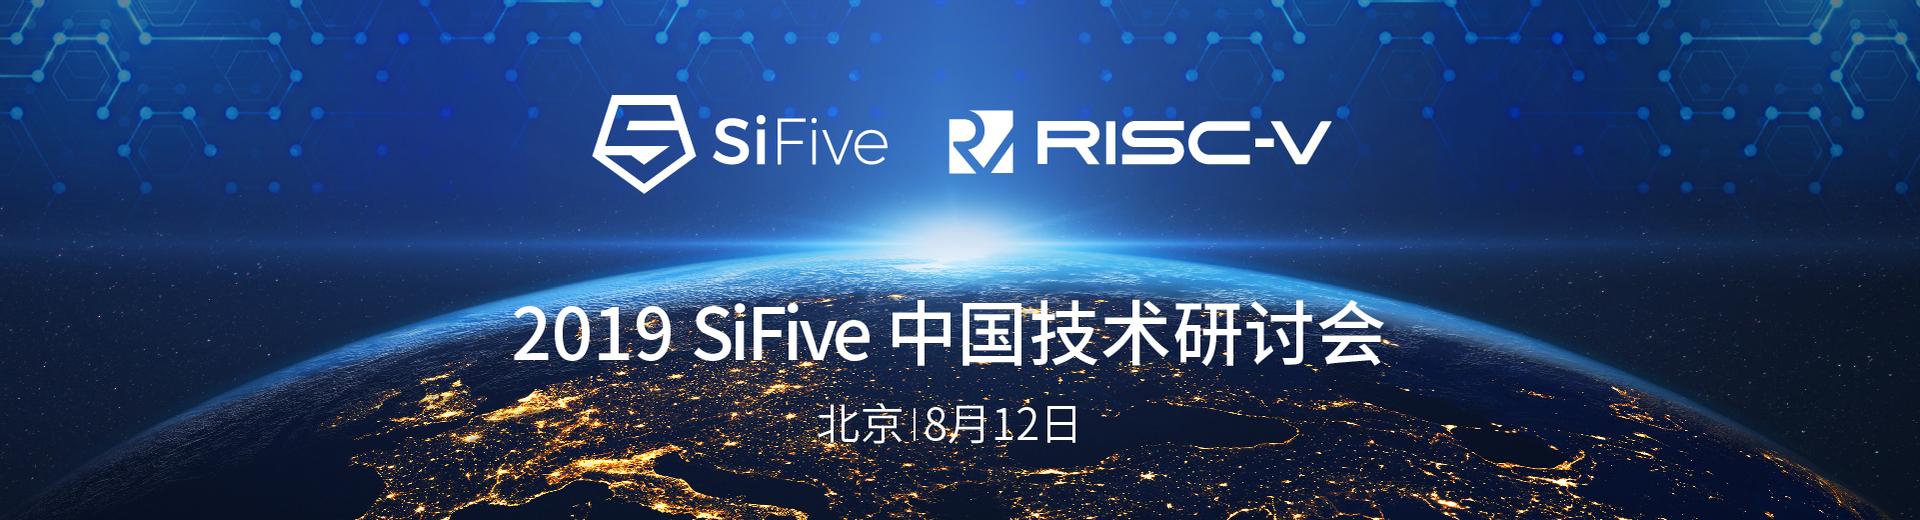 SiFive中国技术研讨会 – 北京场